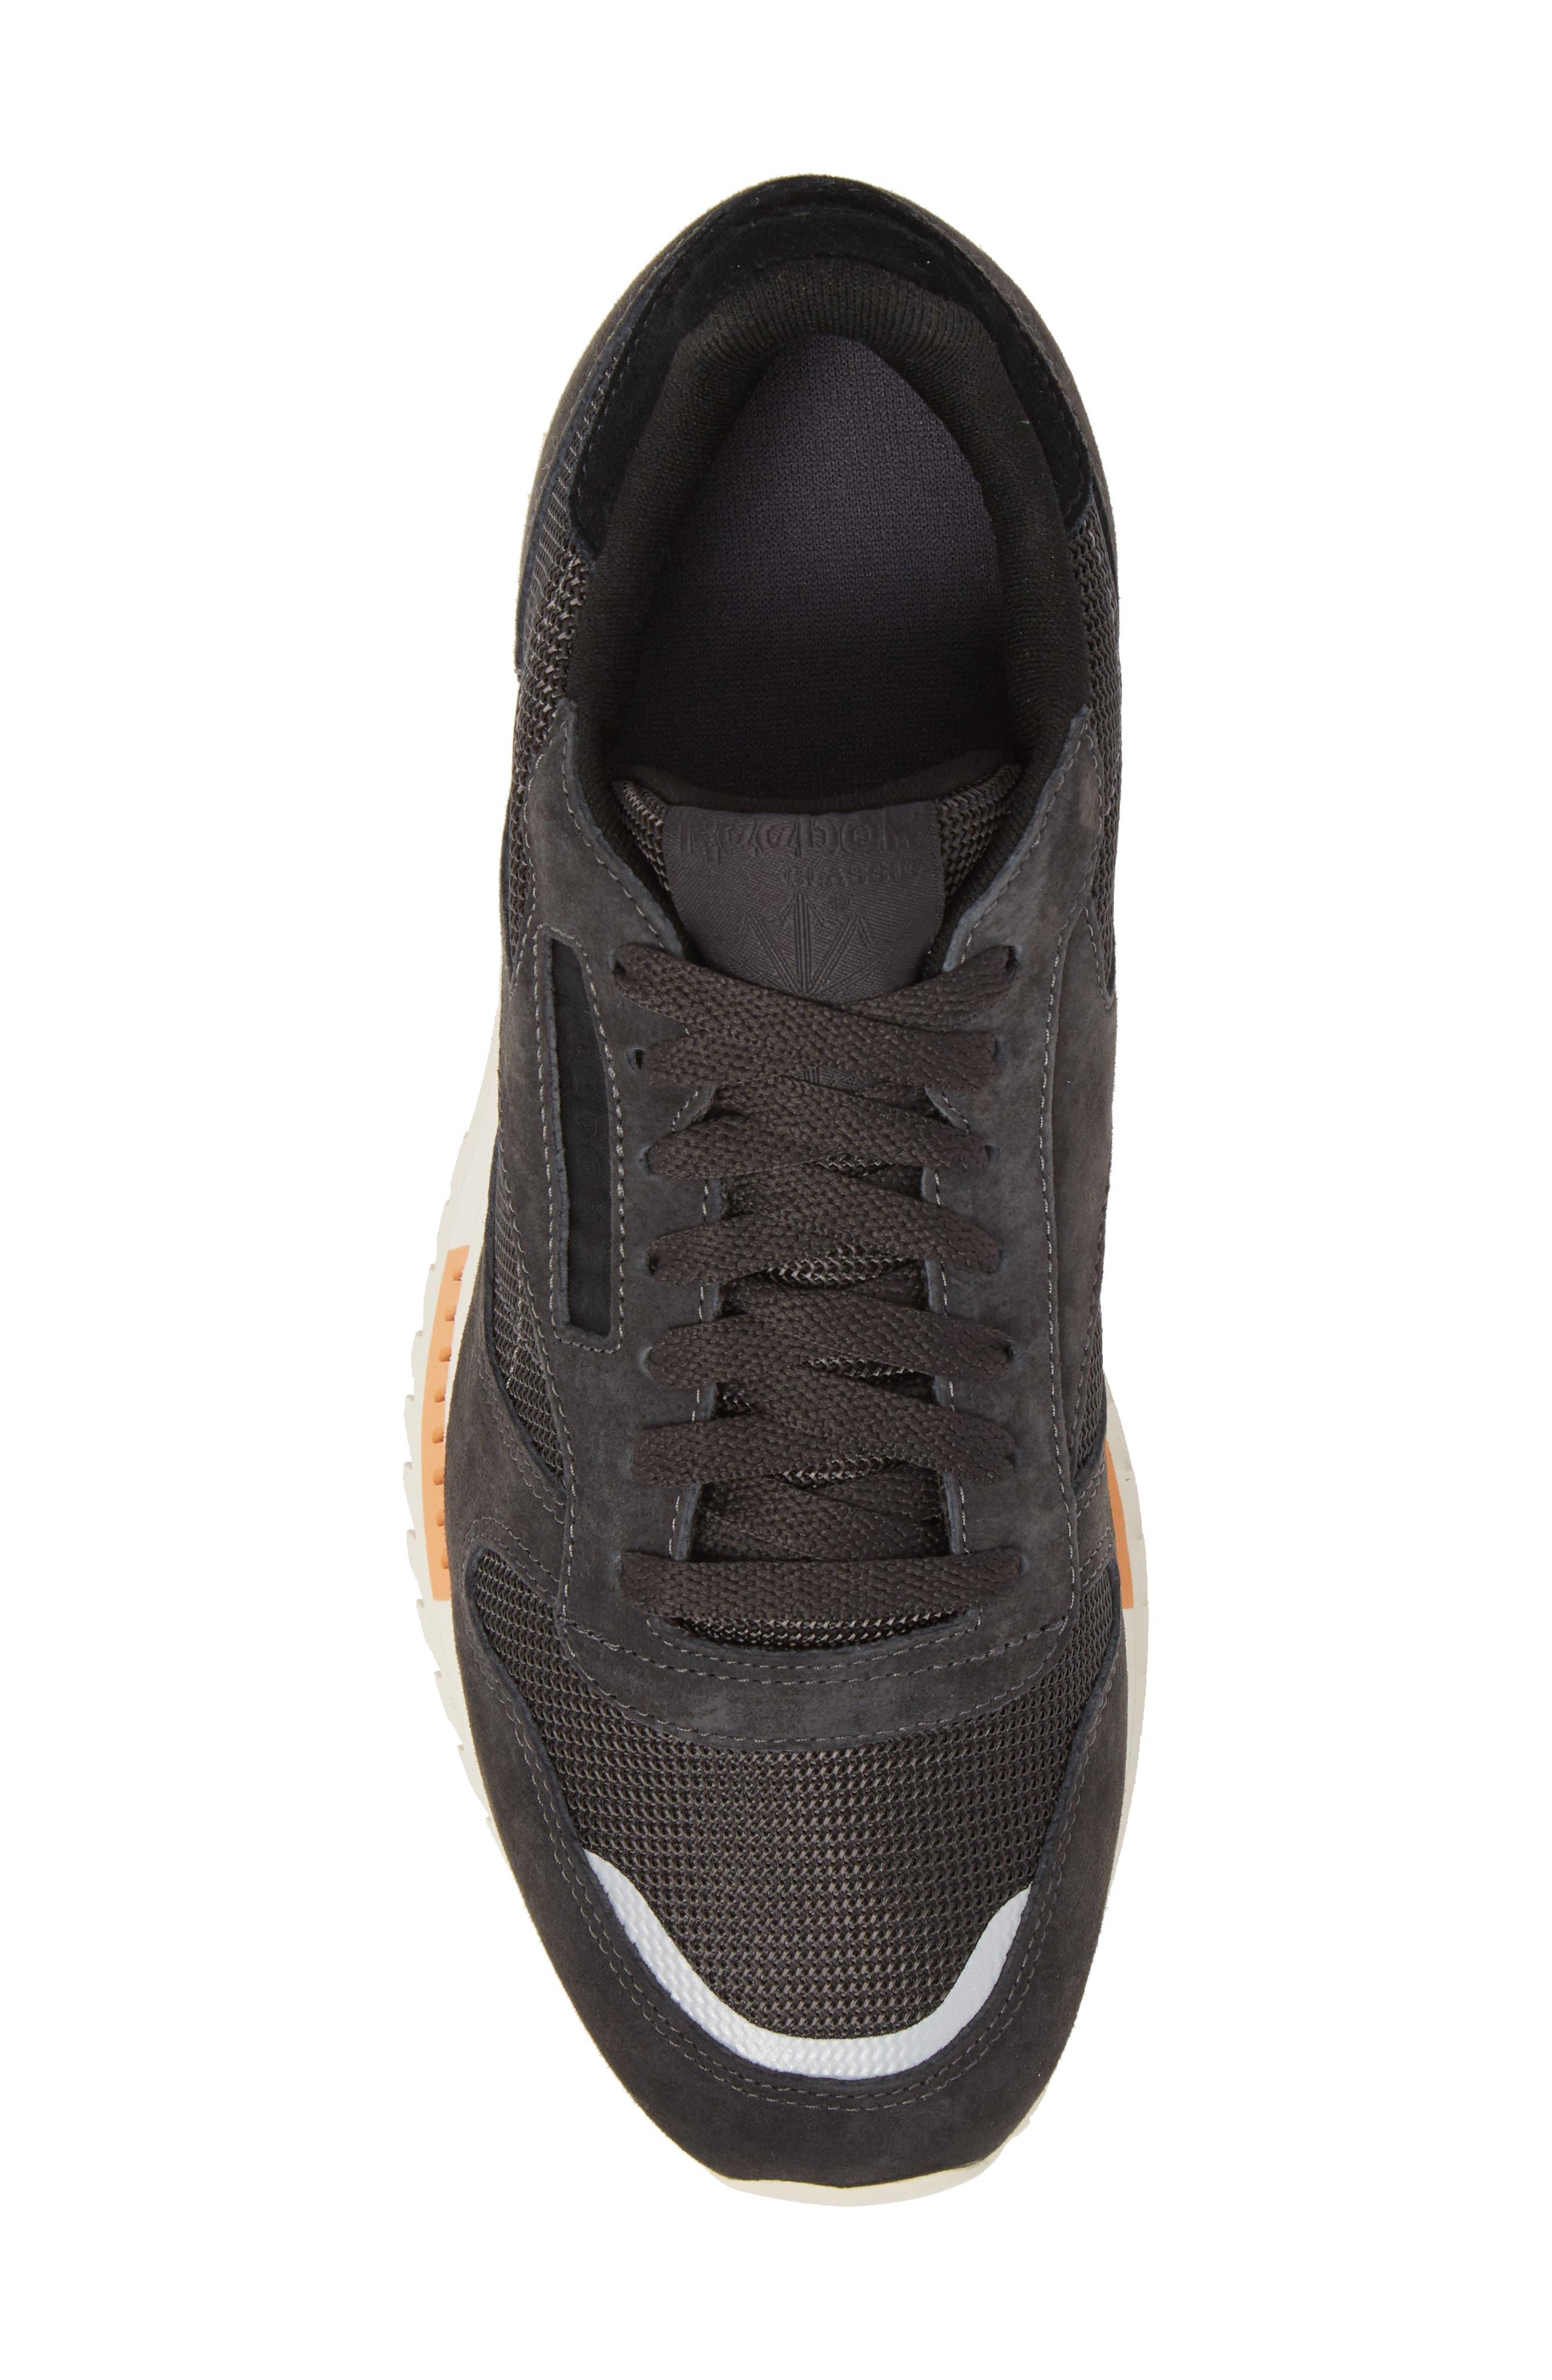 Classic Leather Ripple Sneaker,                             Alternate thumbnail 5, color,                             Coal/ Grey/ White/ Black/ Dust